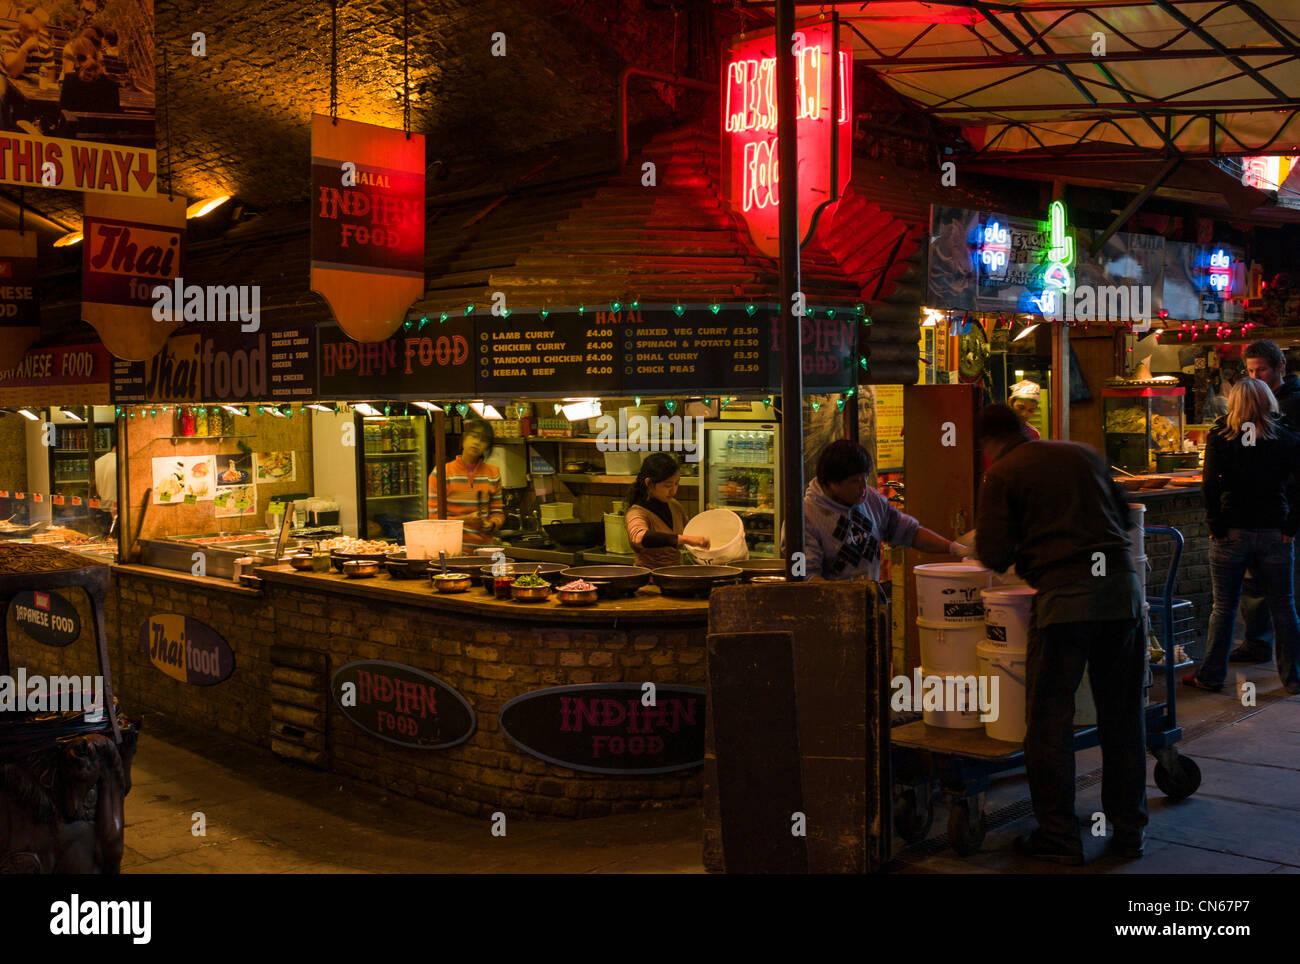 Großartig Küchenarbeitsplatte Lieferanten Nord London Bilder - Ideen ...